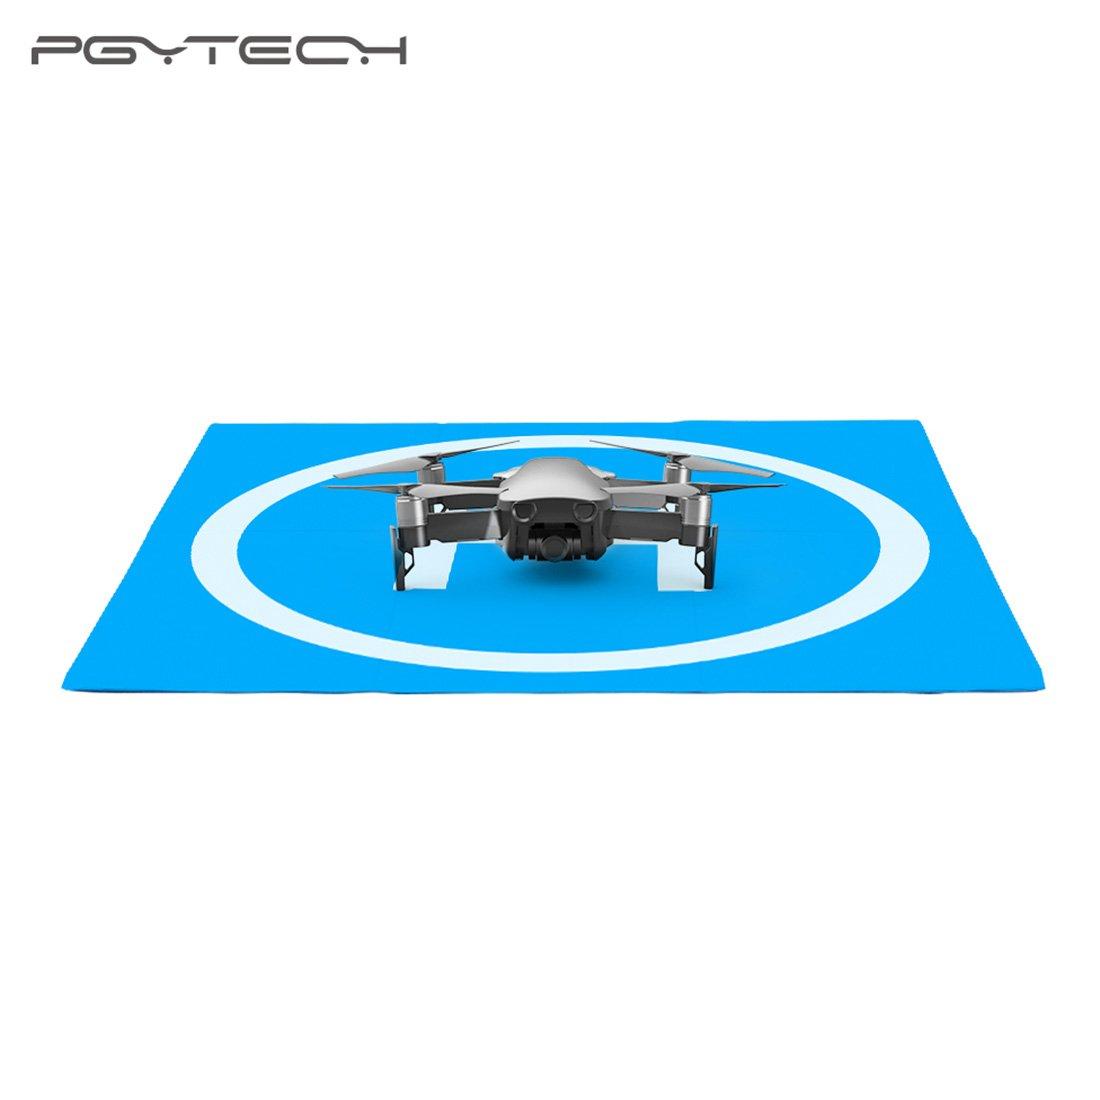 Haoun PGYTECH リモコンロッカープロテクター DJI Mavic 2 PRO/Mavic 2 Zoom用 クアッドコプターアクセサリー S 1833523898948 B07HNJPT8G S Landing Pad Landing Pad S